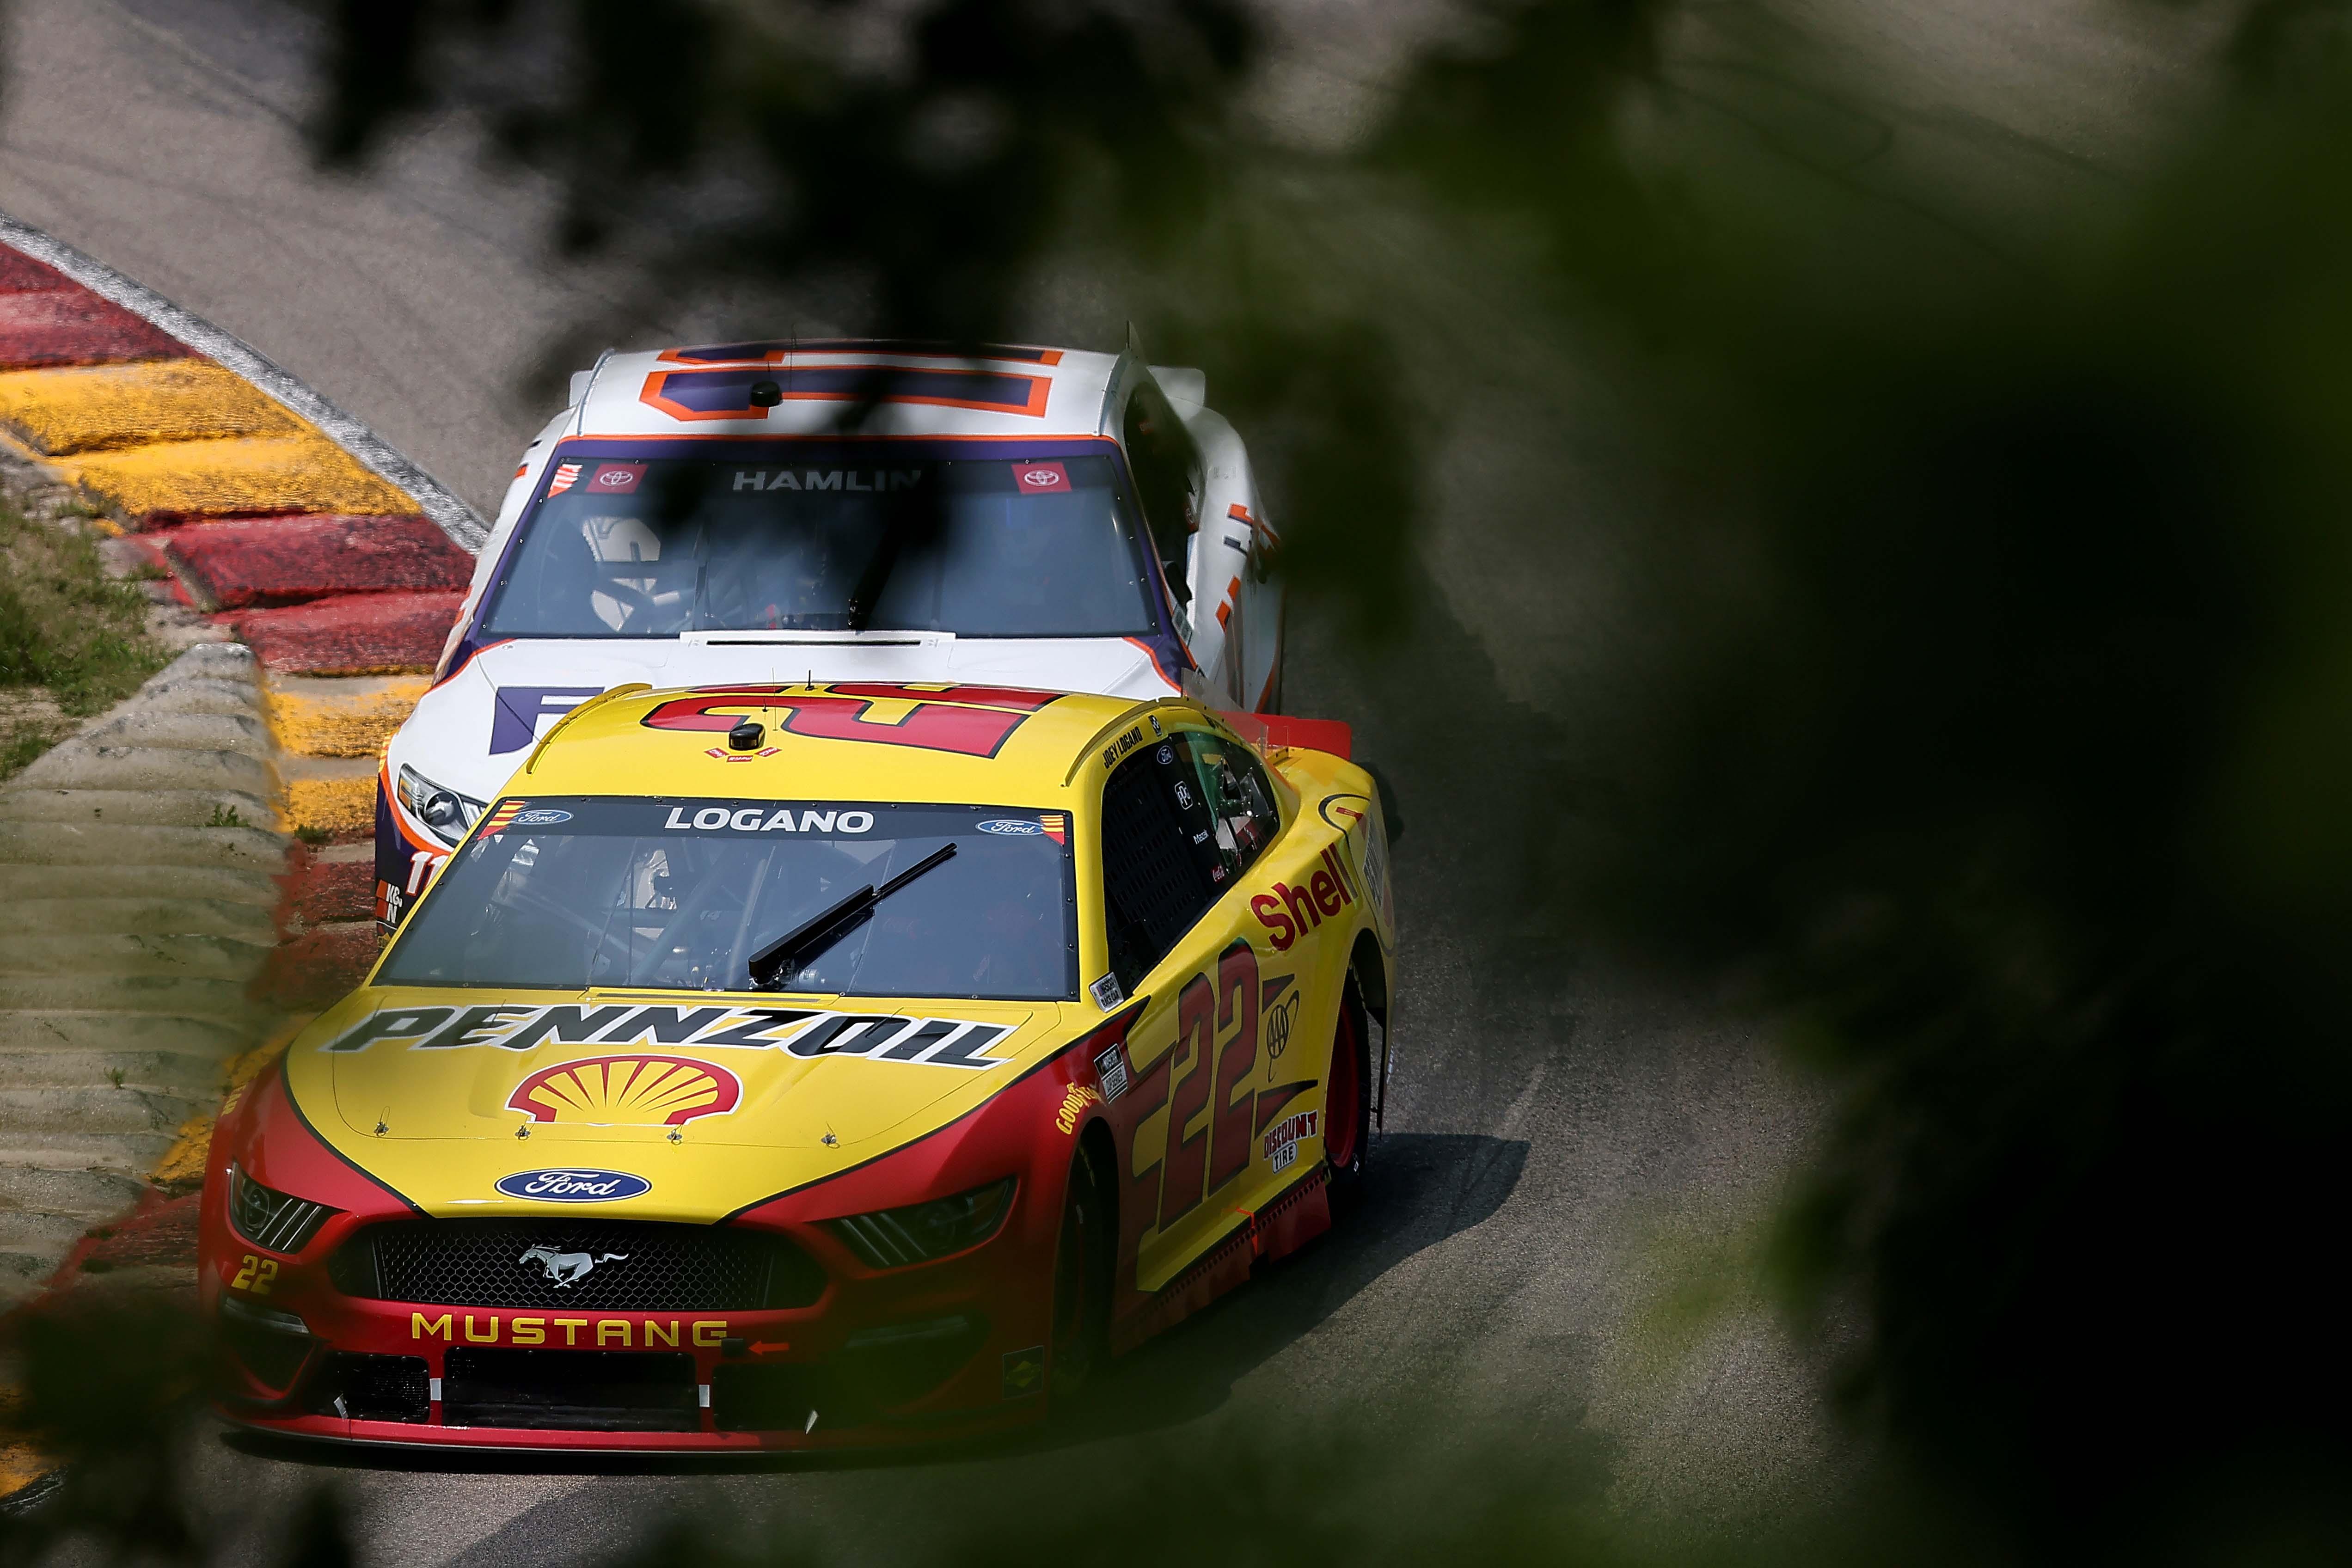 Joey Logano, Denny Hamlin - Road America - NASCAR Cup Series